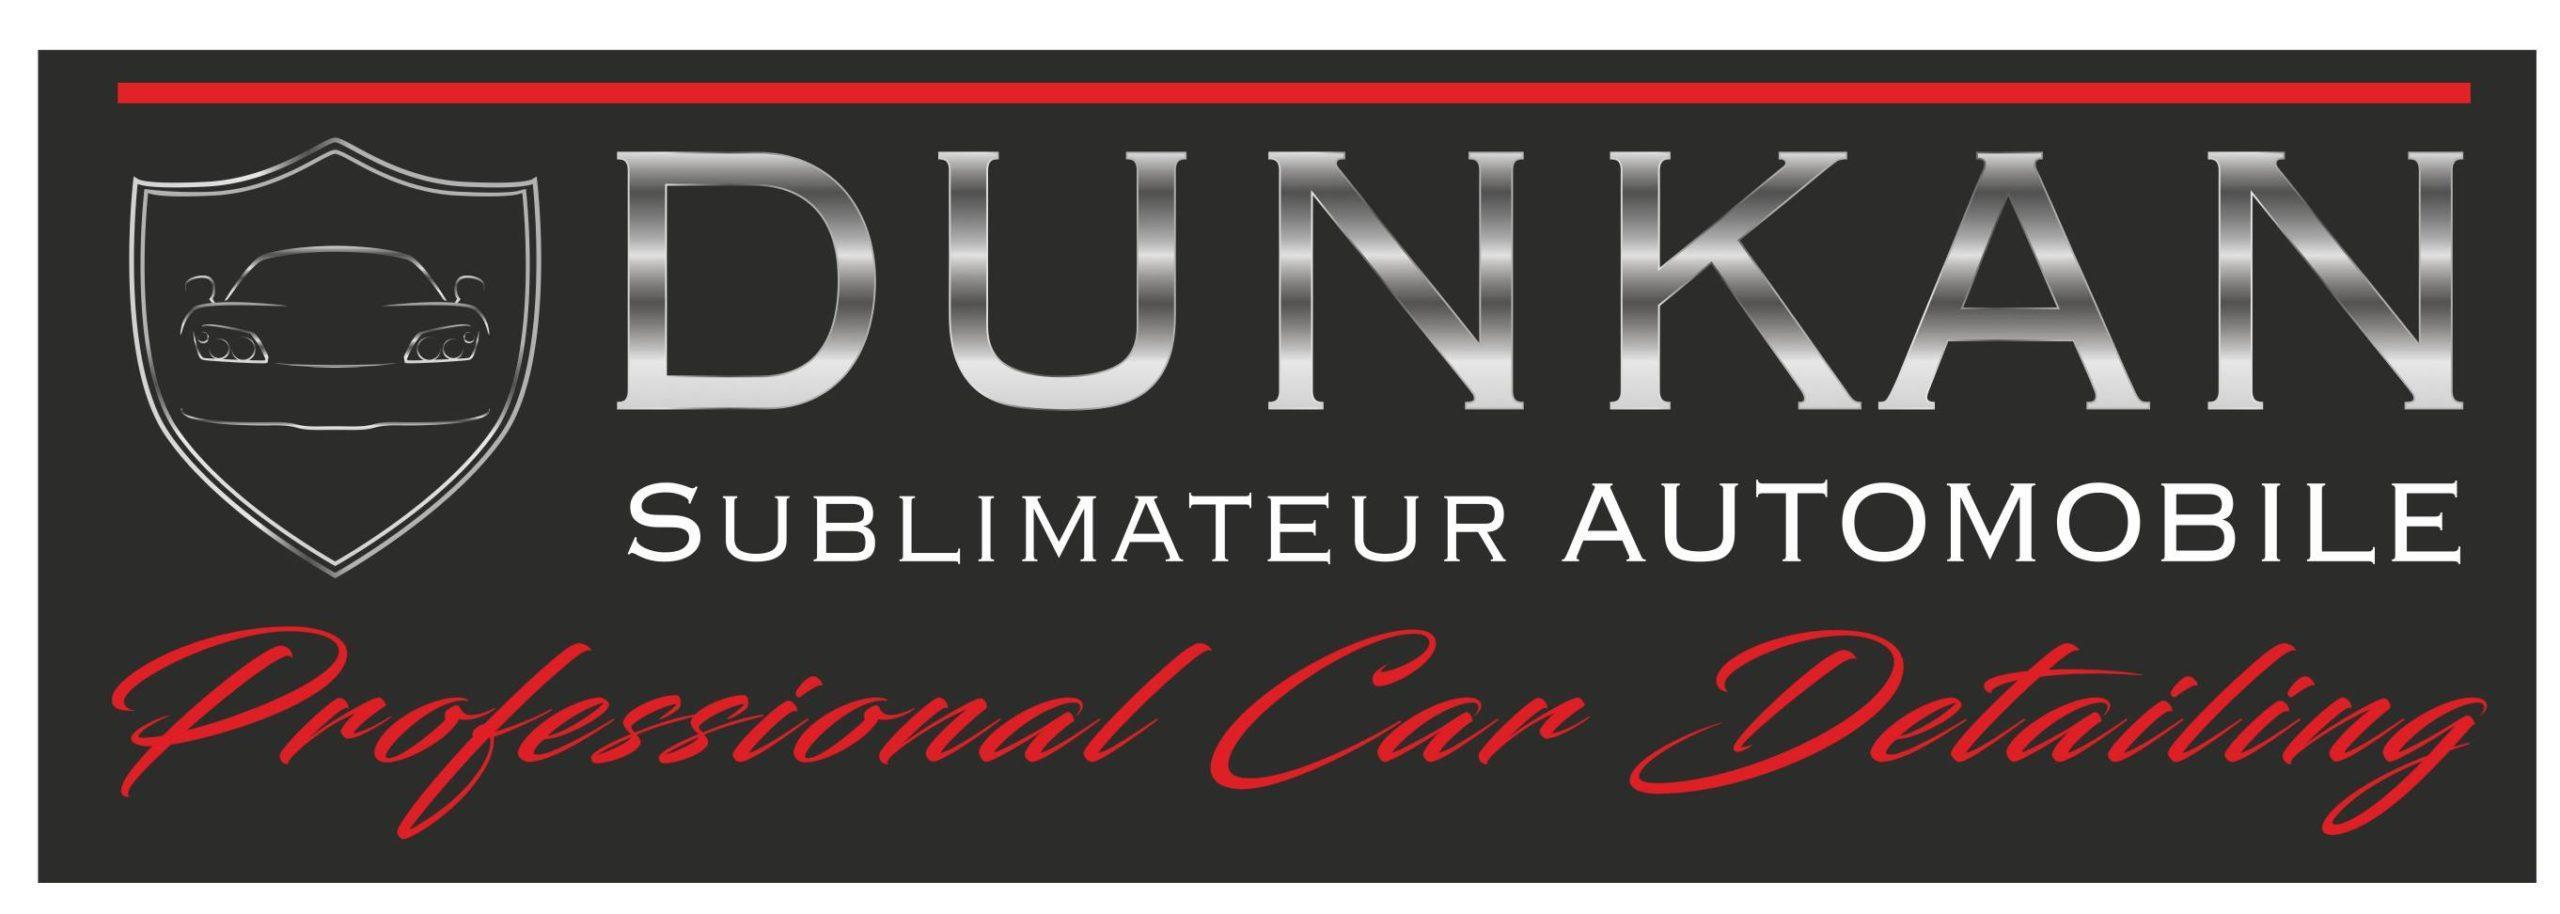 Dunkan Sublimateur Automobile